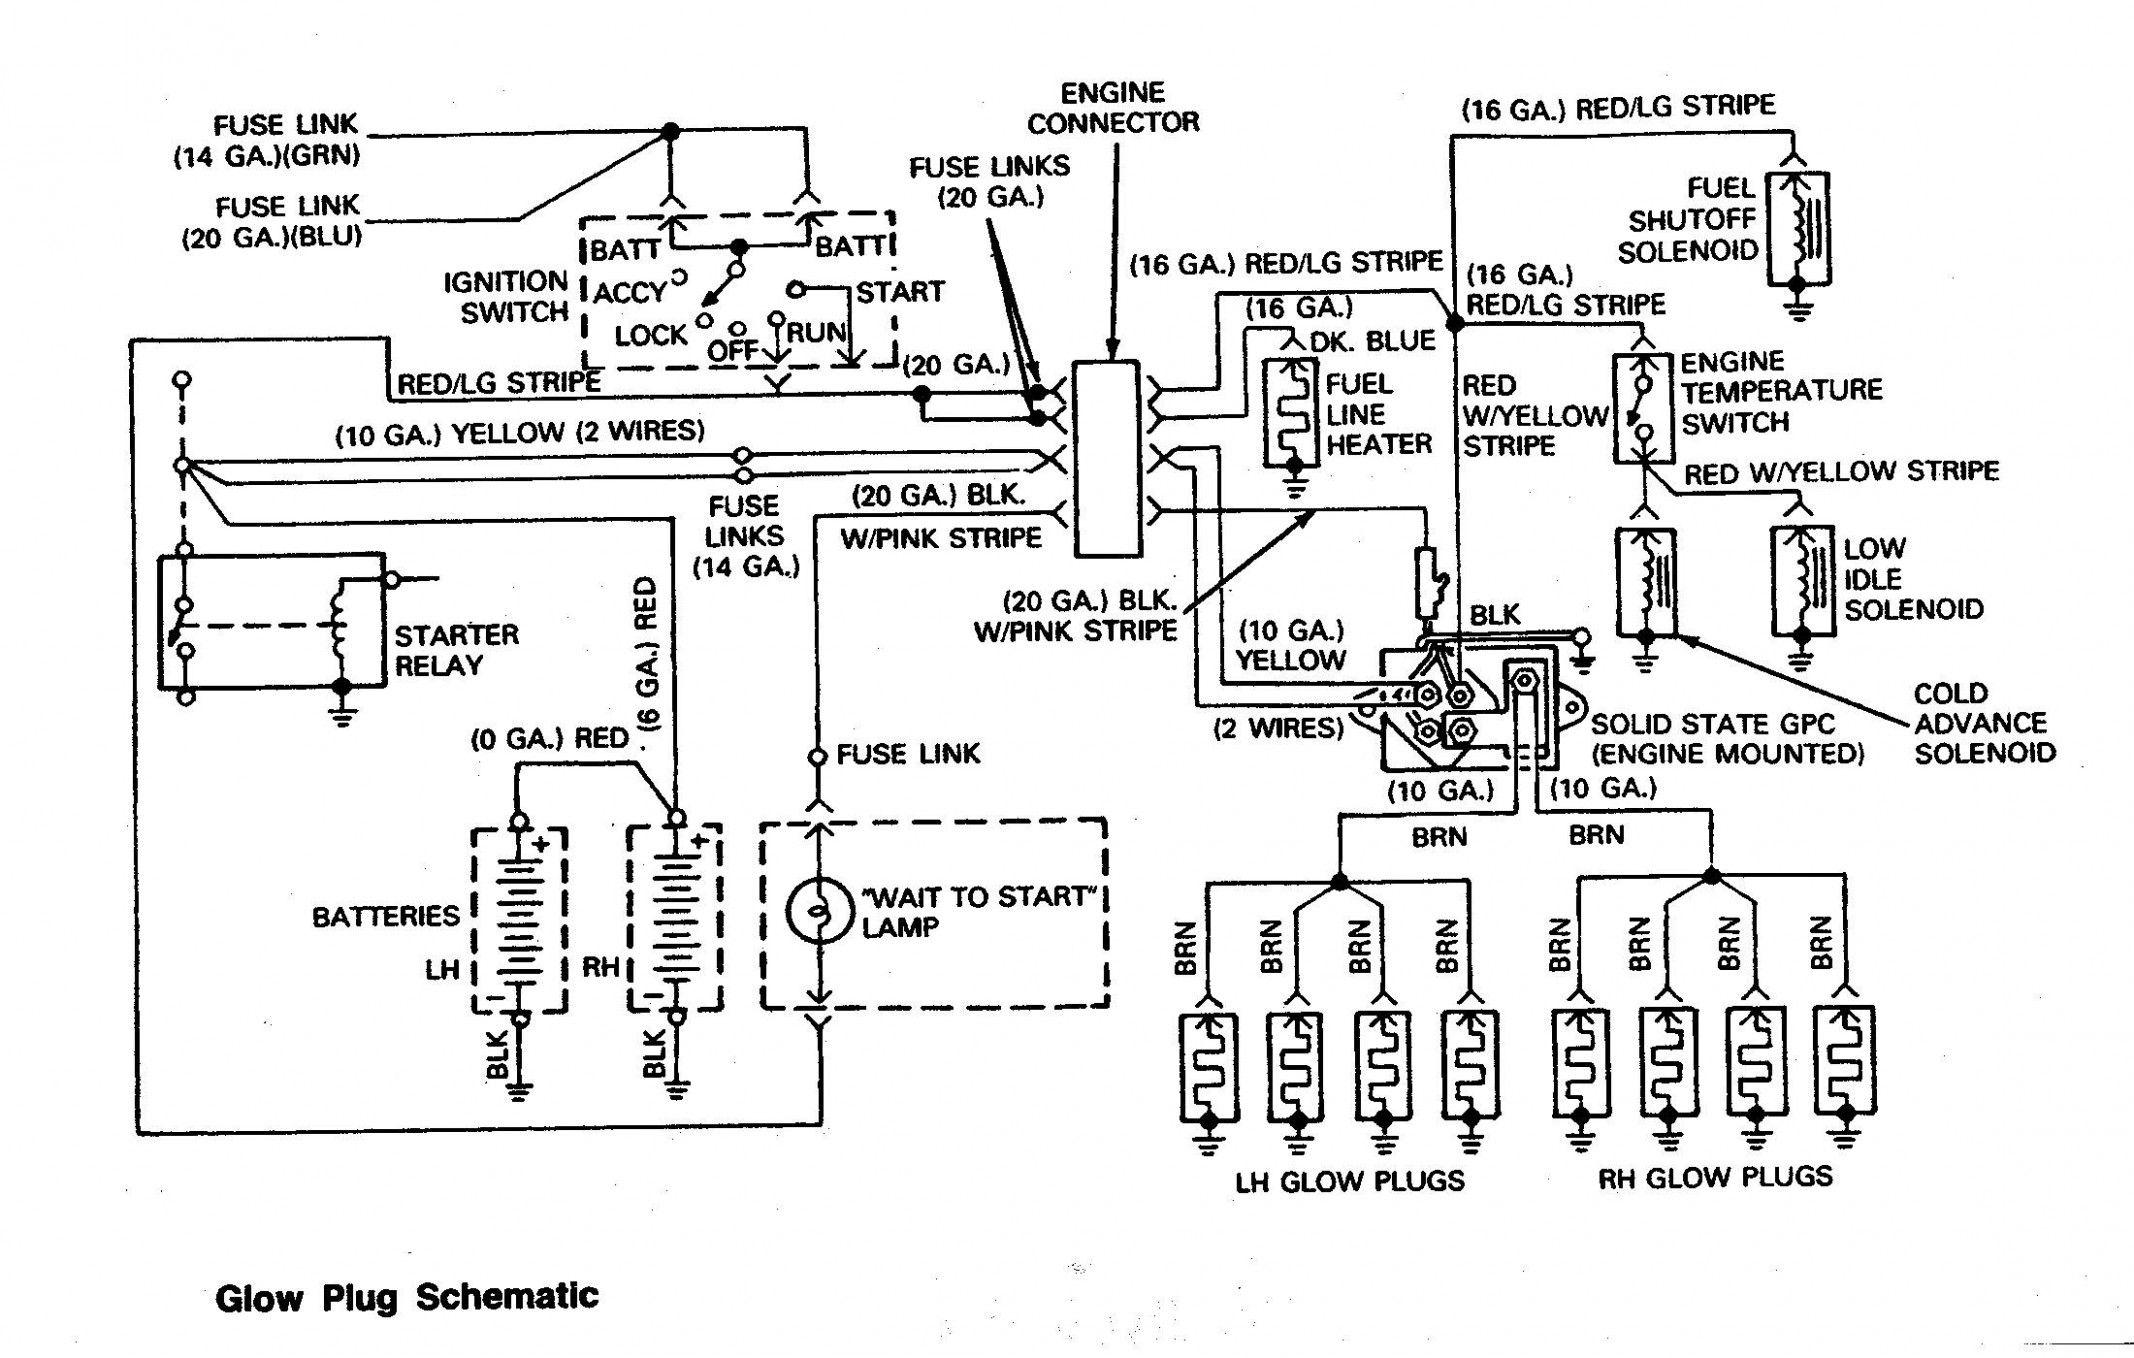 Jet Engine Block Diagram Diesel Diagram Ford